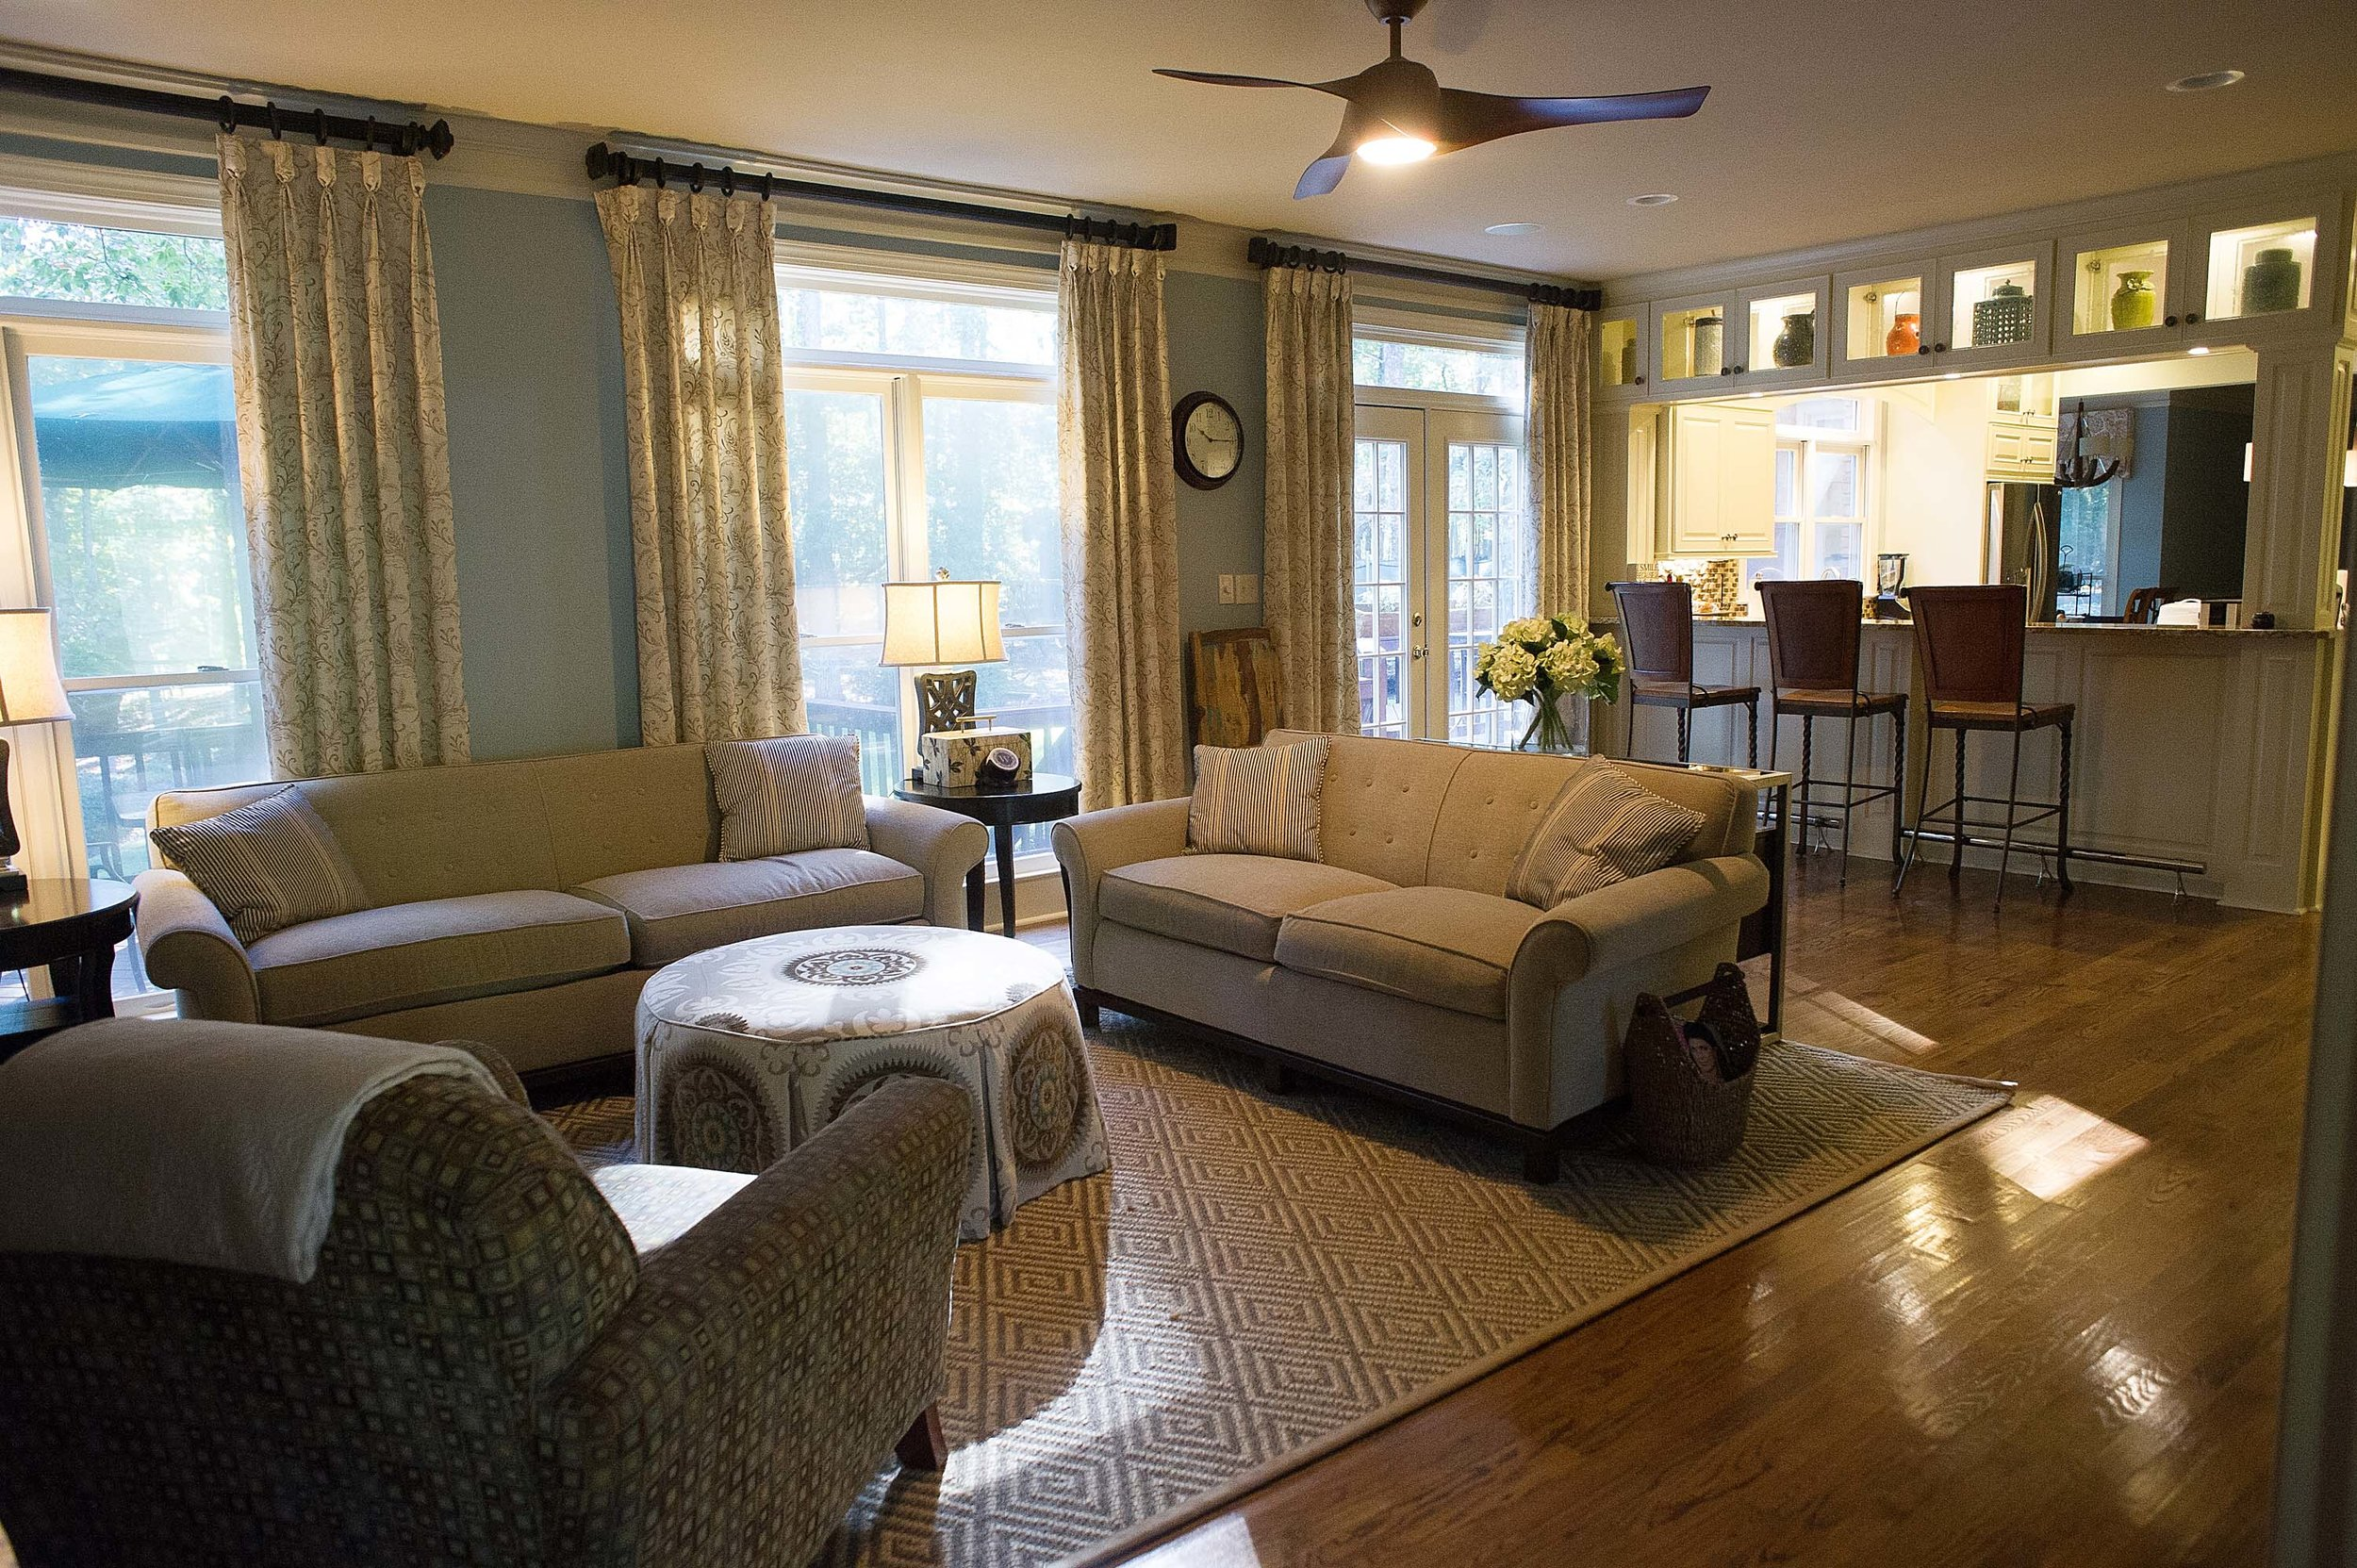 Modern living room with breakfast bar